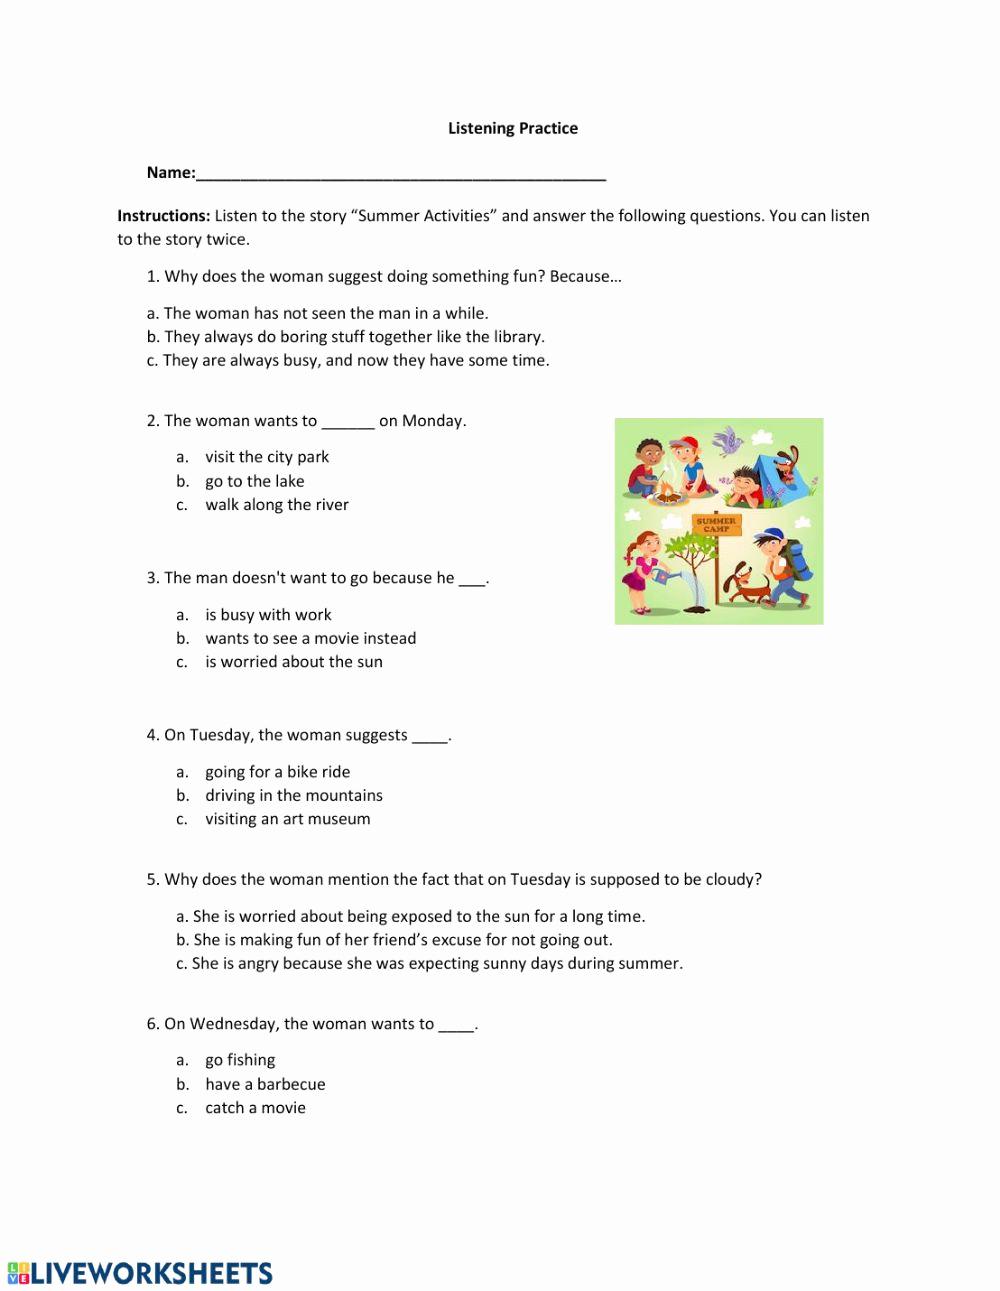 Language Arts Worksheets 8th Grade Luxury 20 8th Grade Language Arts Worksheets